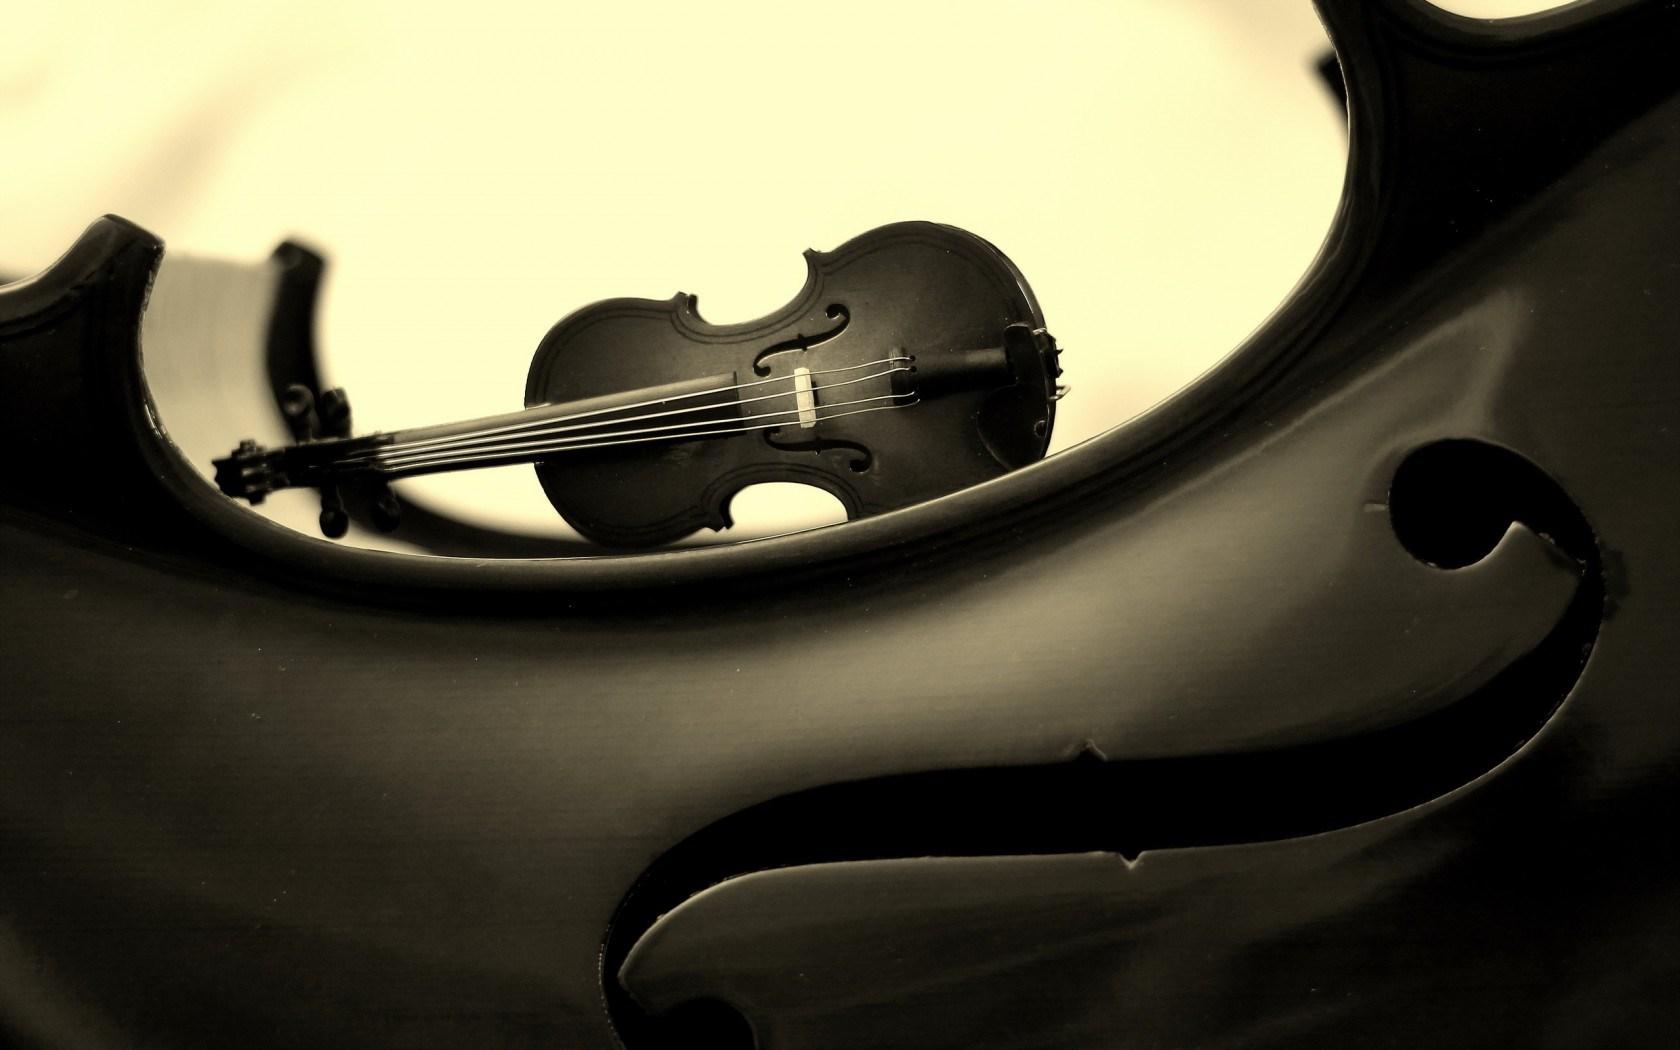 violin art music black and white vintage background wallpaper 1680x1050